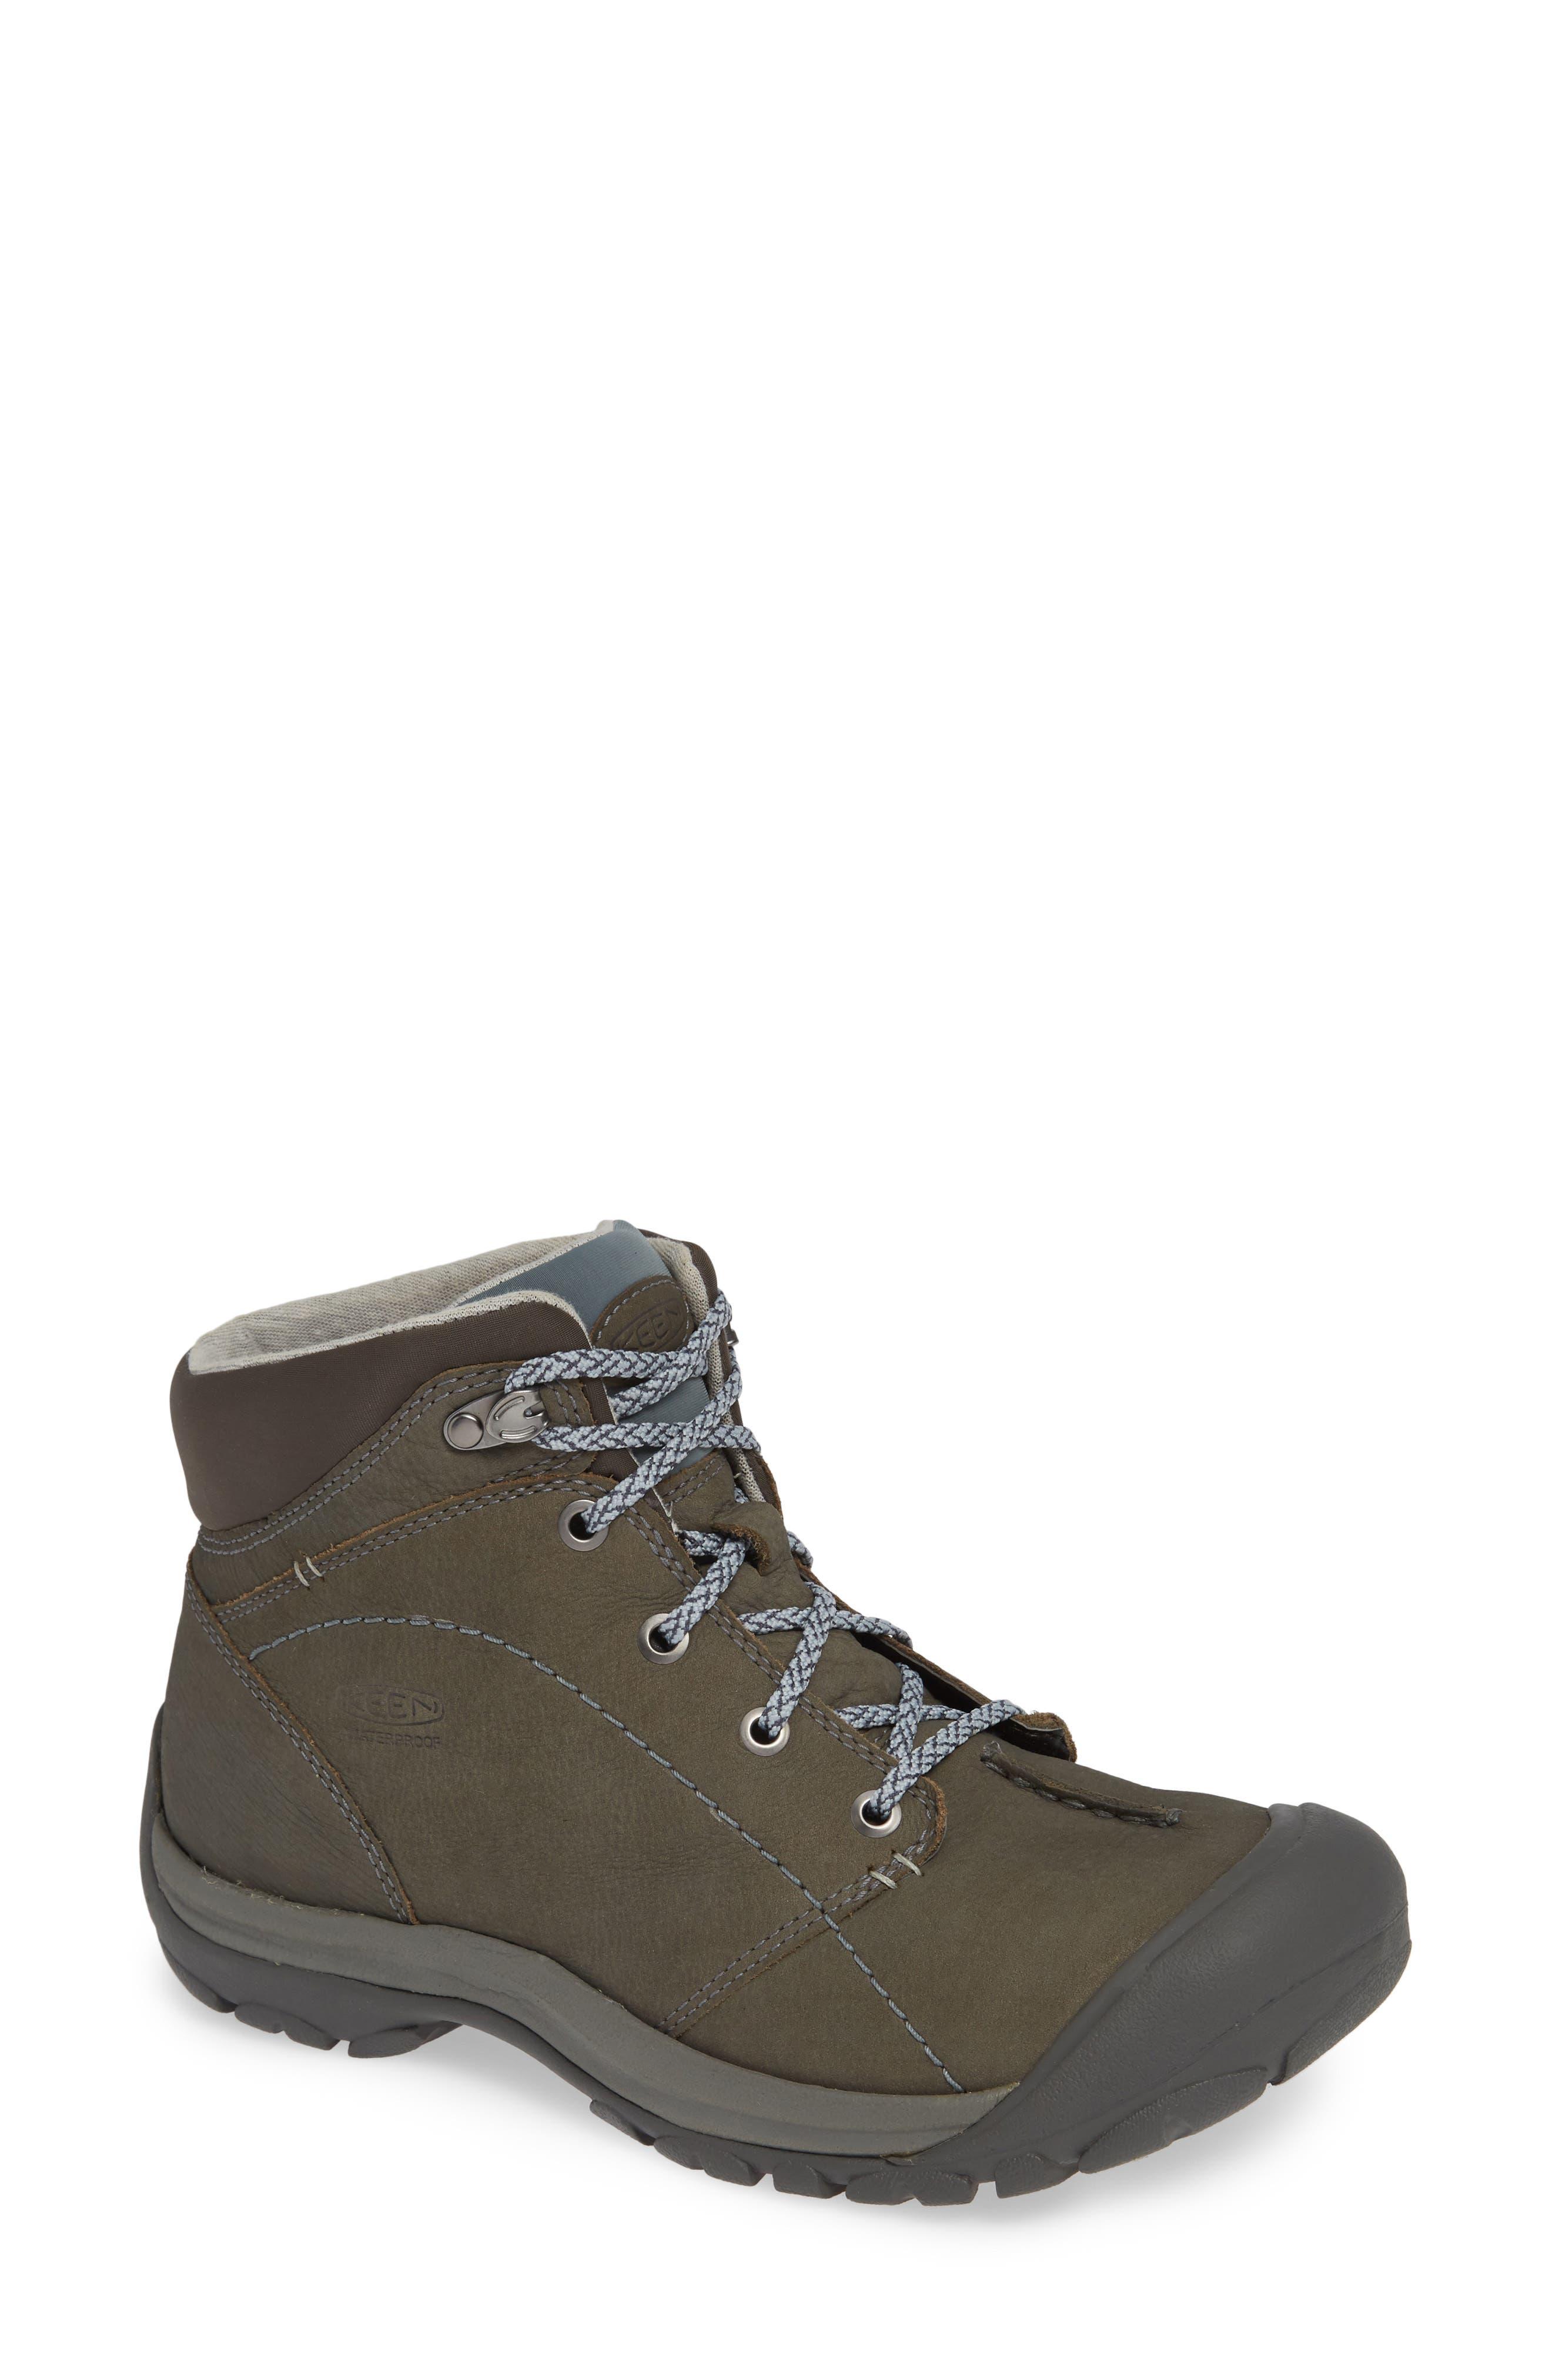 Kaci Waterproof Winter Boot,                         Main,                         color, TURBULENCE/ STORMY WEATHER